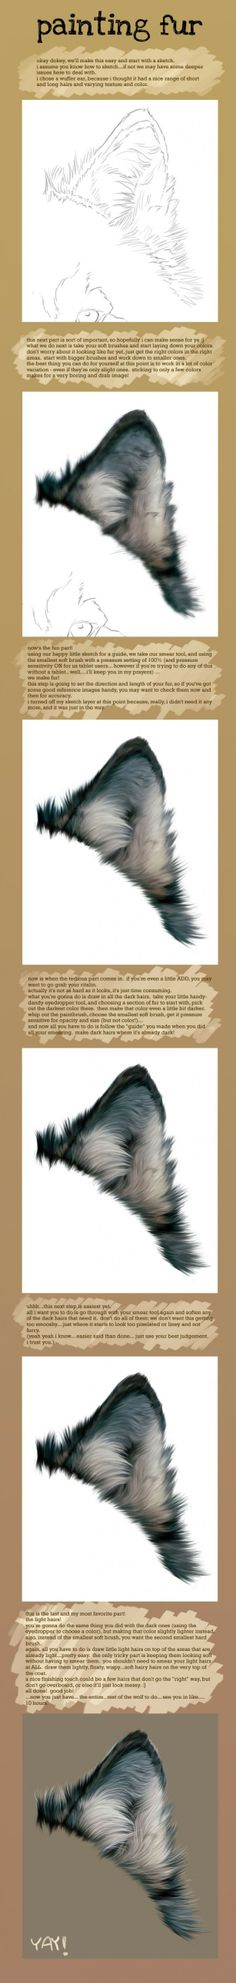 tutorial digital painting Painting Fur by novawuff [dA] Digital Painting Tutorials, Digital Art Tutorial, Art Tutorials, Drawing Tutorials, Painting Fur, Painting & Drawing, Drawing Fur, Purple Painting, Painting Tips